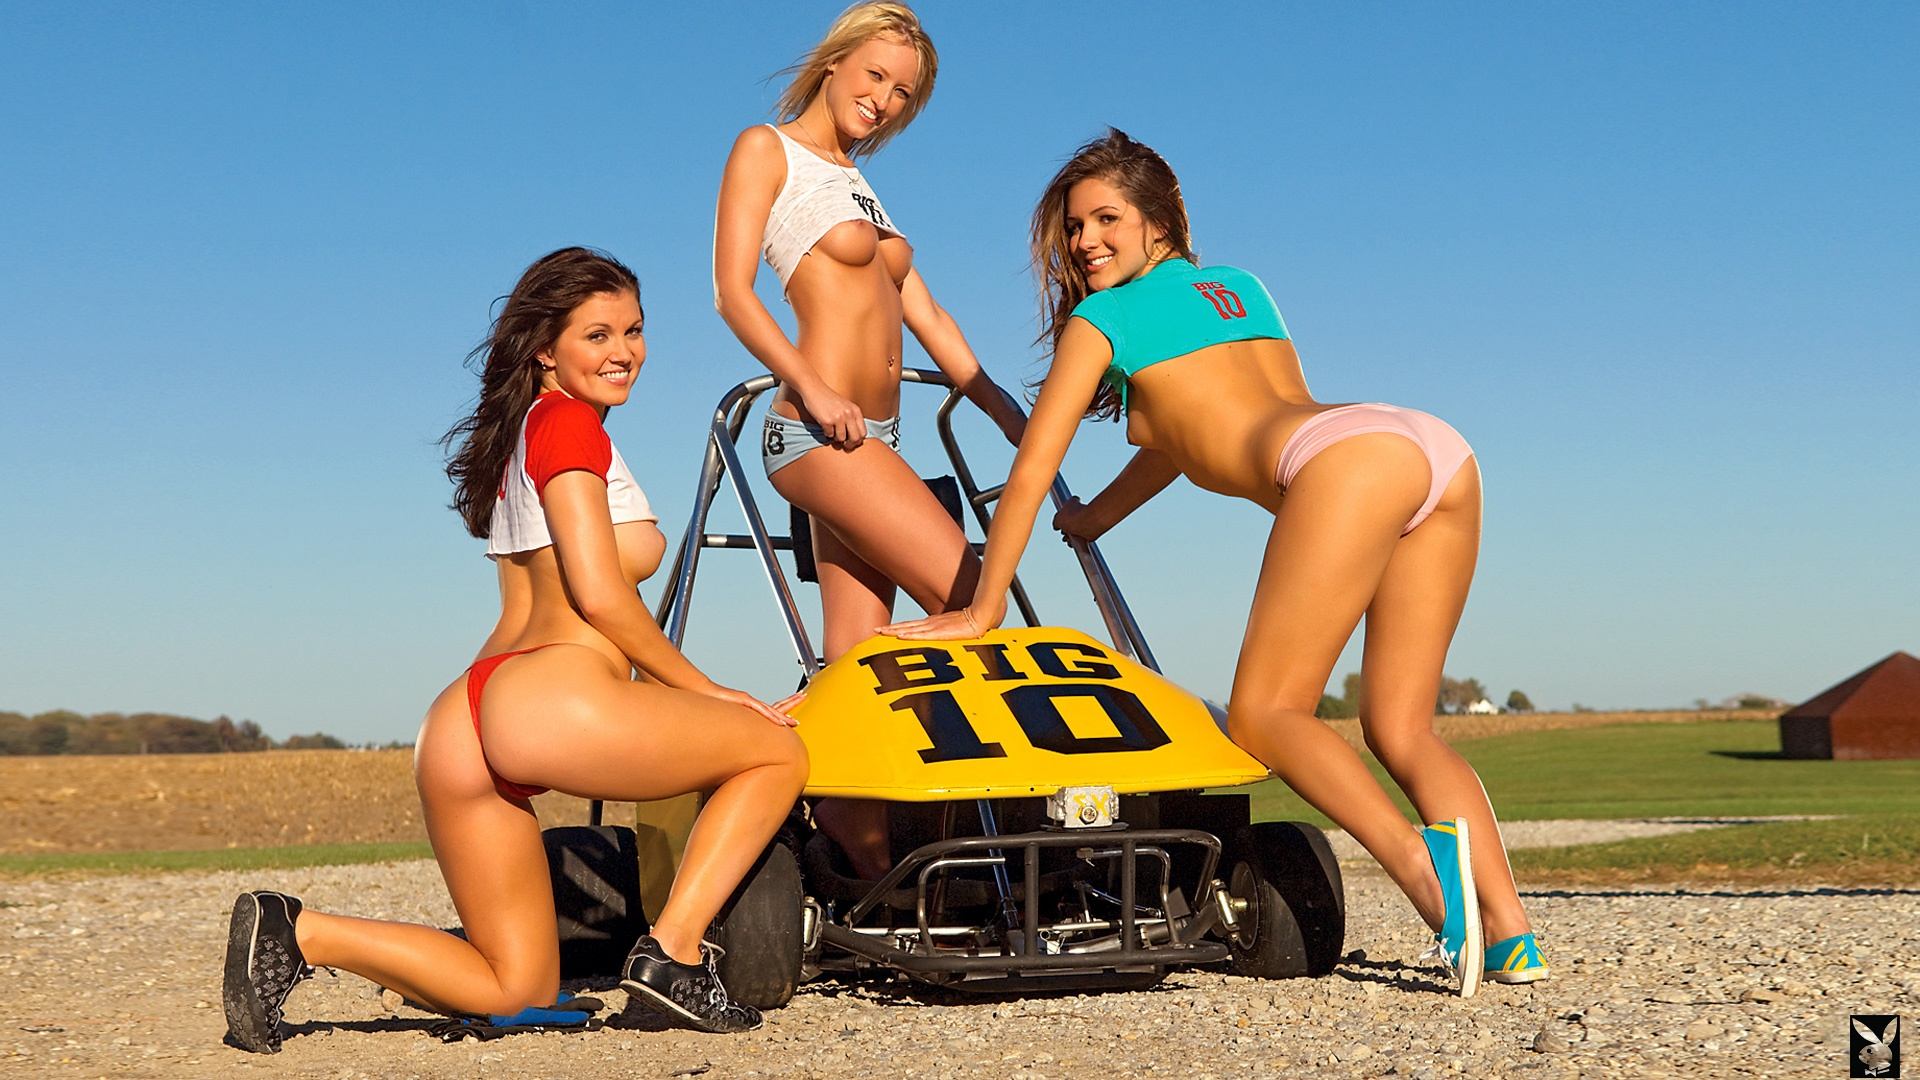 Refuse. think, nude girls on go kart